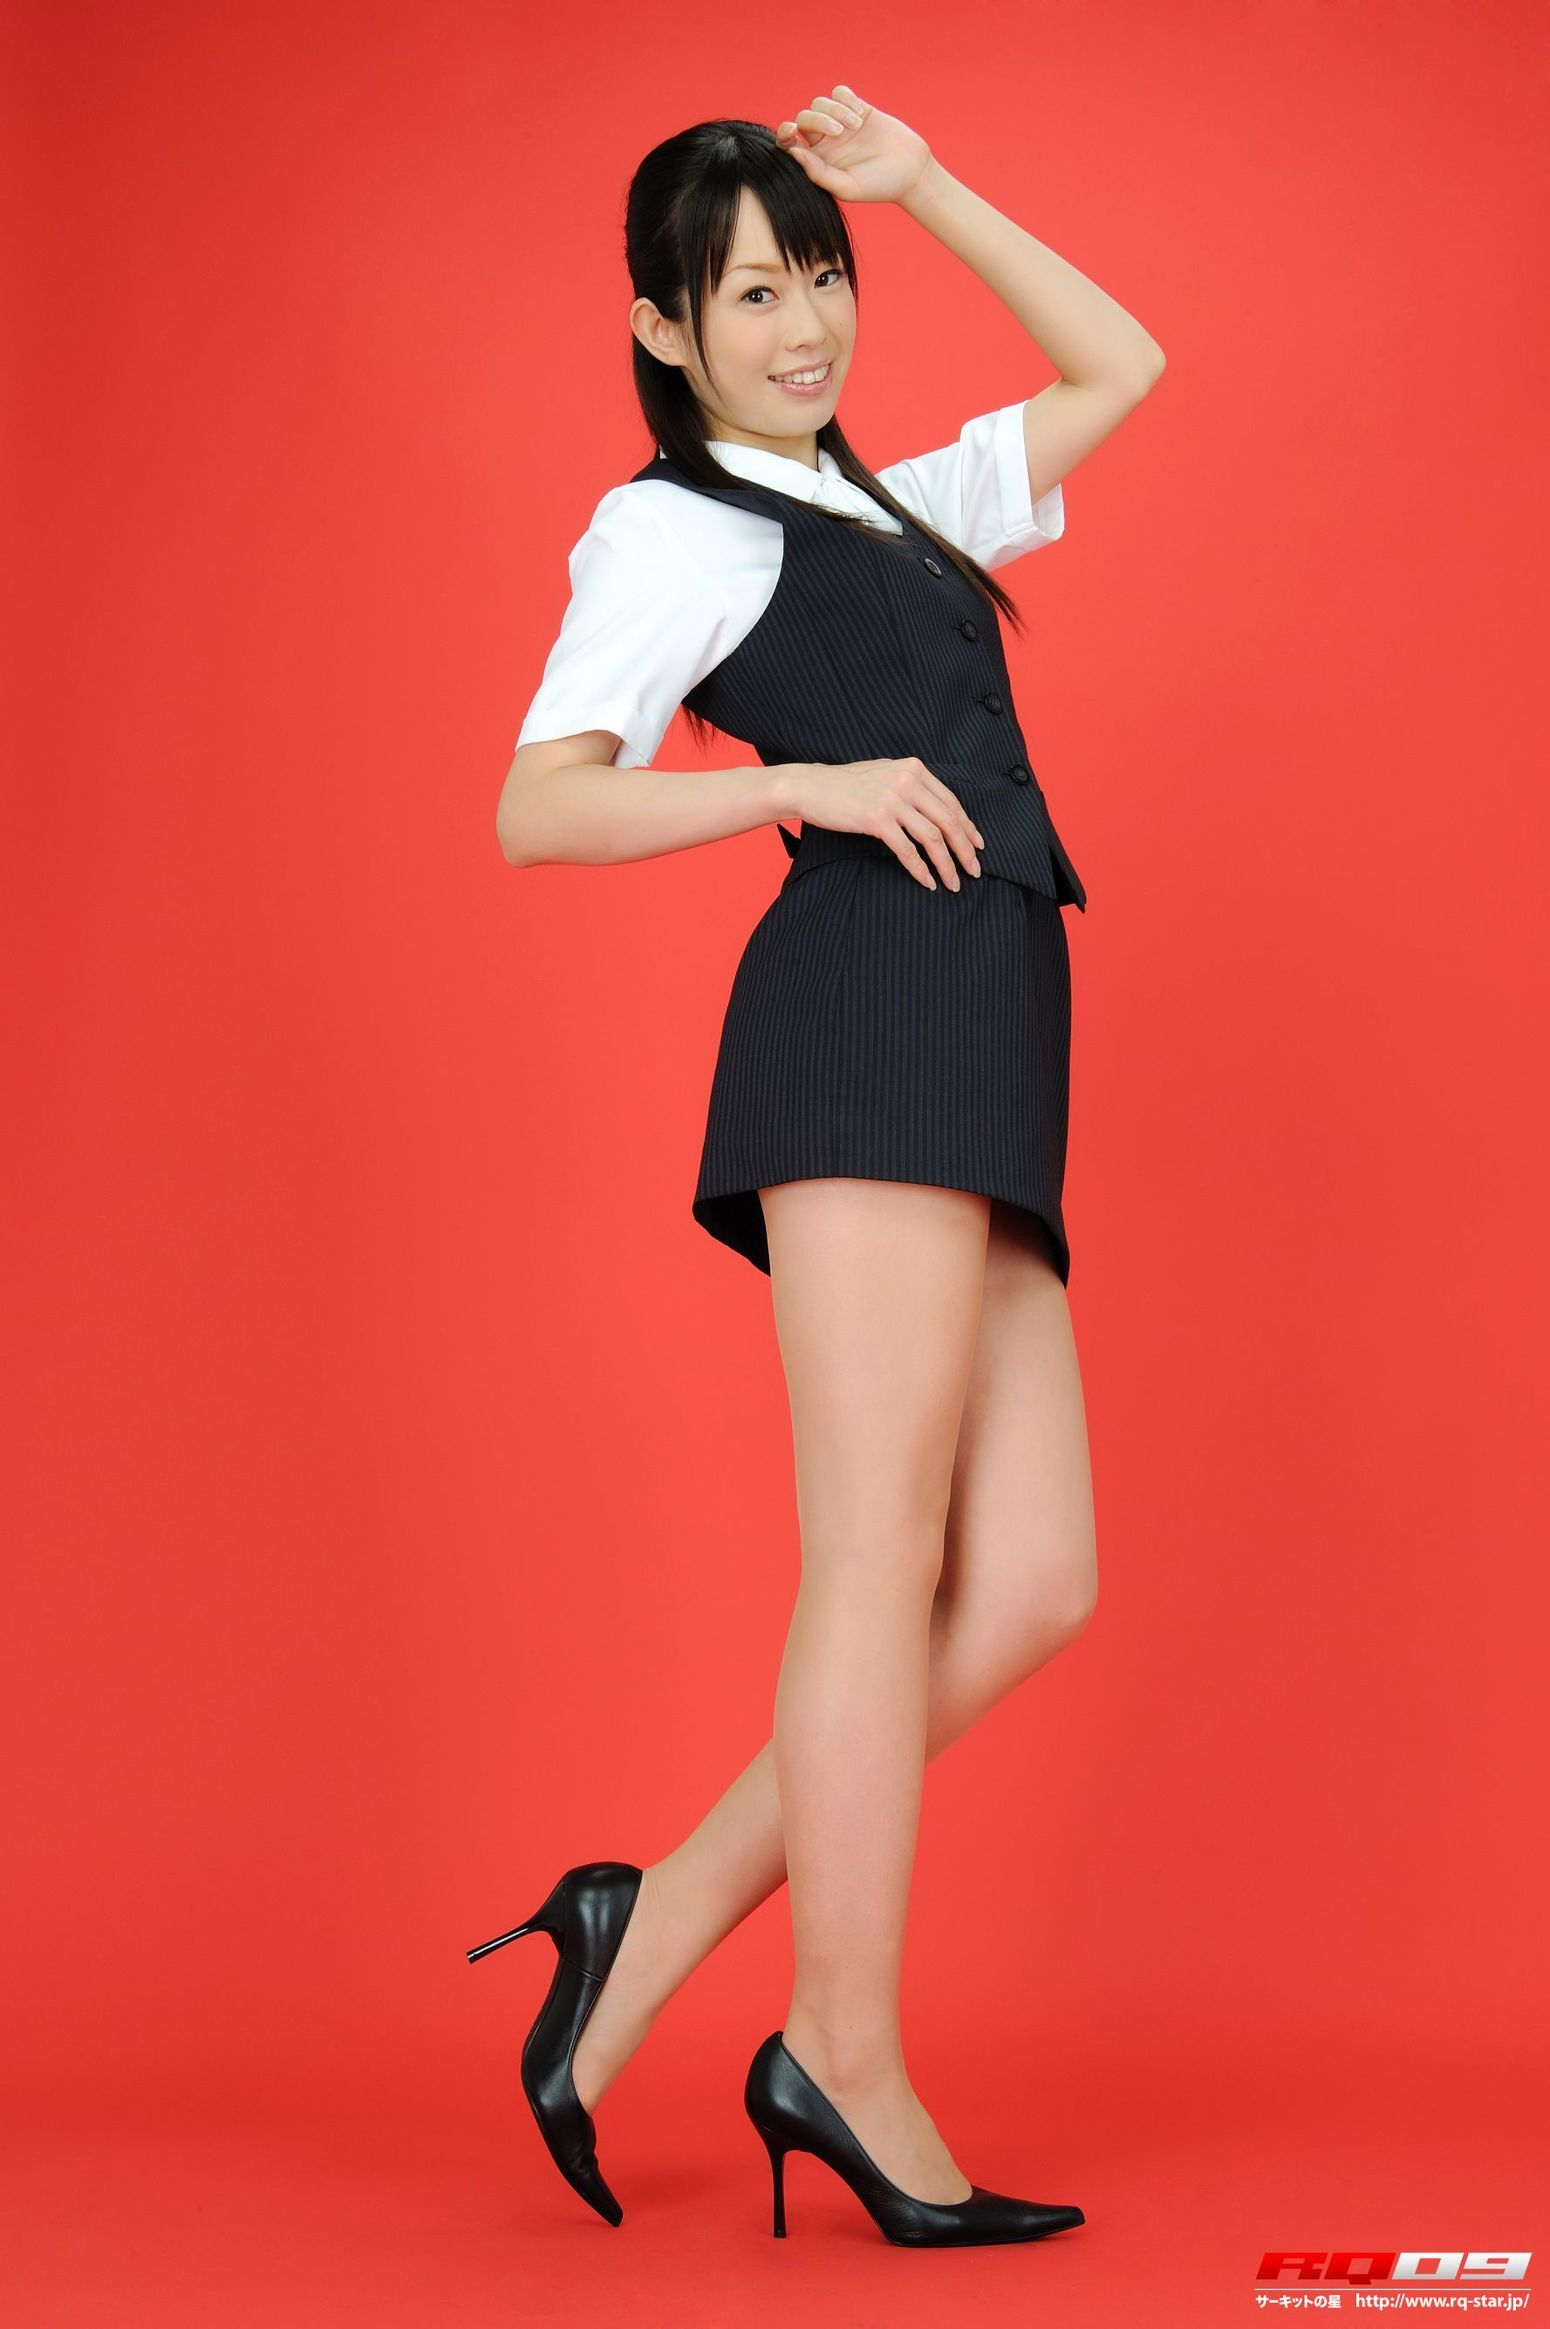 [RQ-STAR] NO.00193 Miyuki Koizumi 小泉みゆき Office Lady 写真集(9) -美女